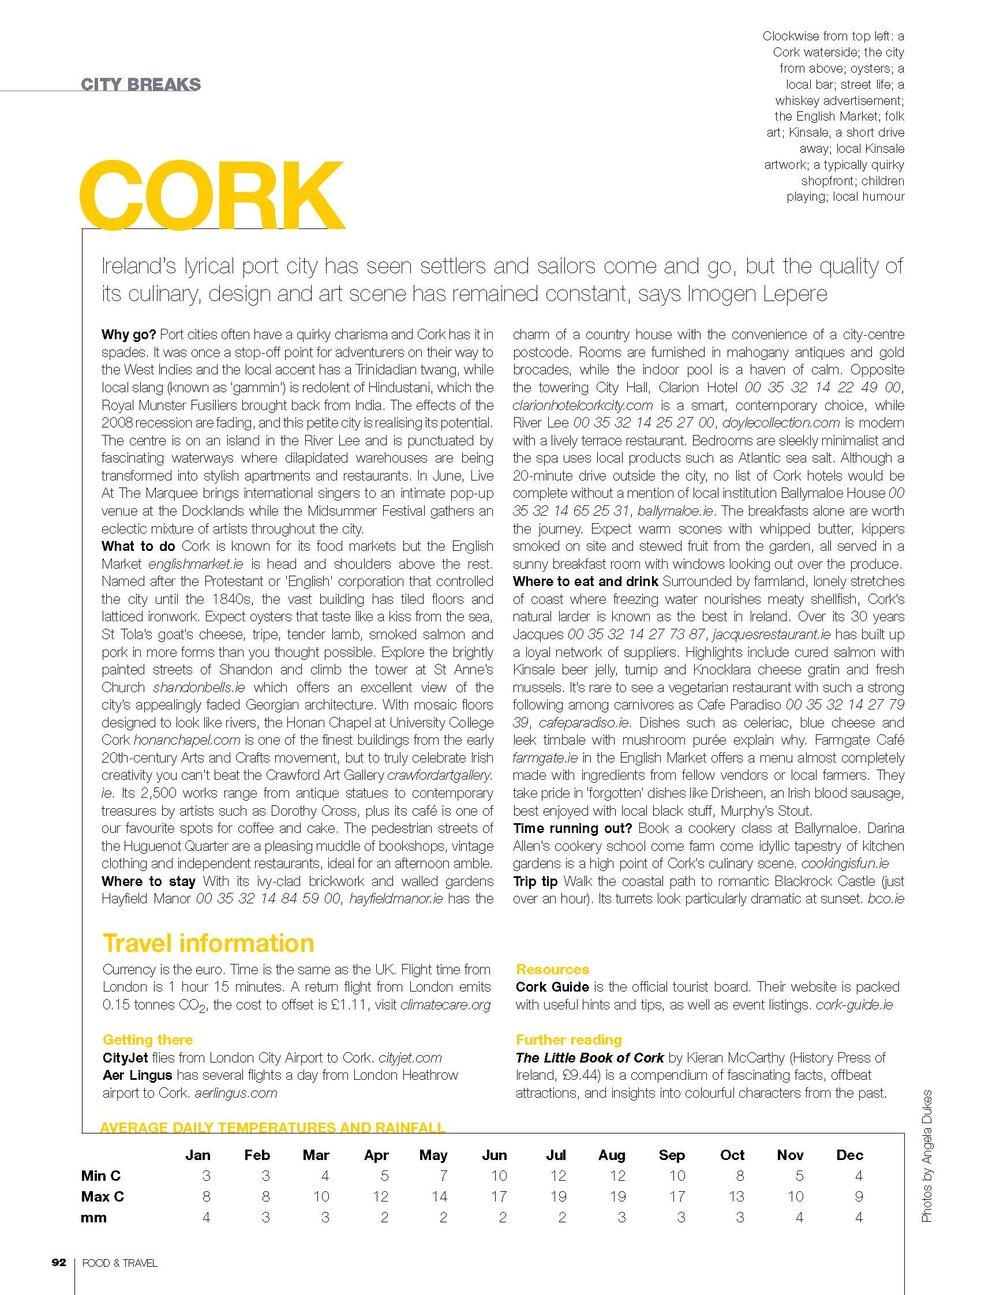 093_F&TJune16_Cork_Page_1.jpg